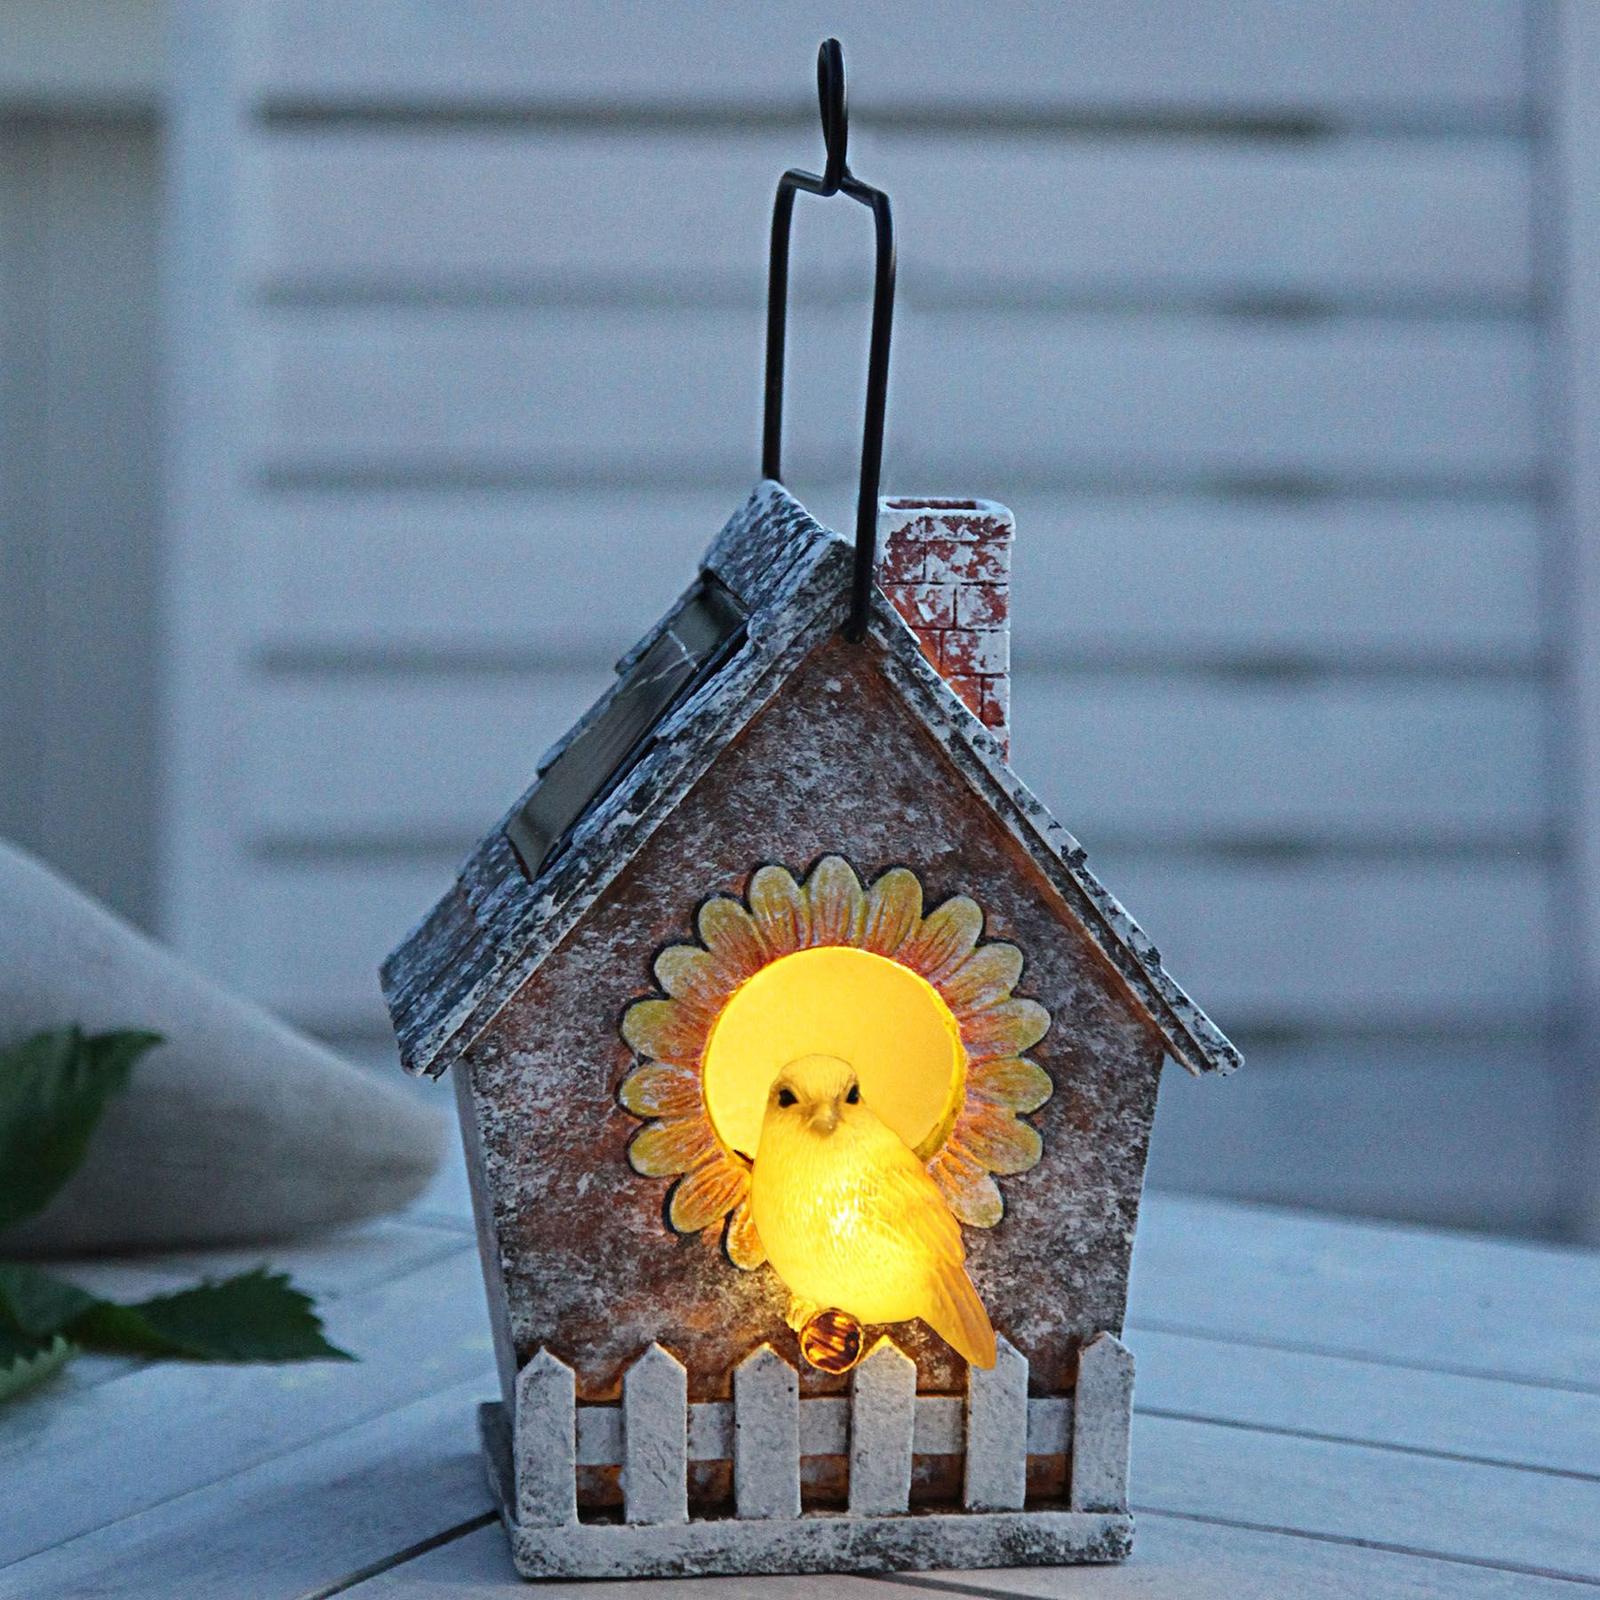 Solcelle-LED-lampe Vogelhaus